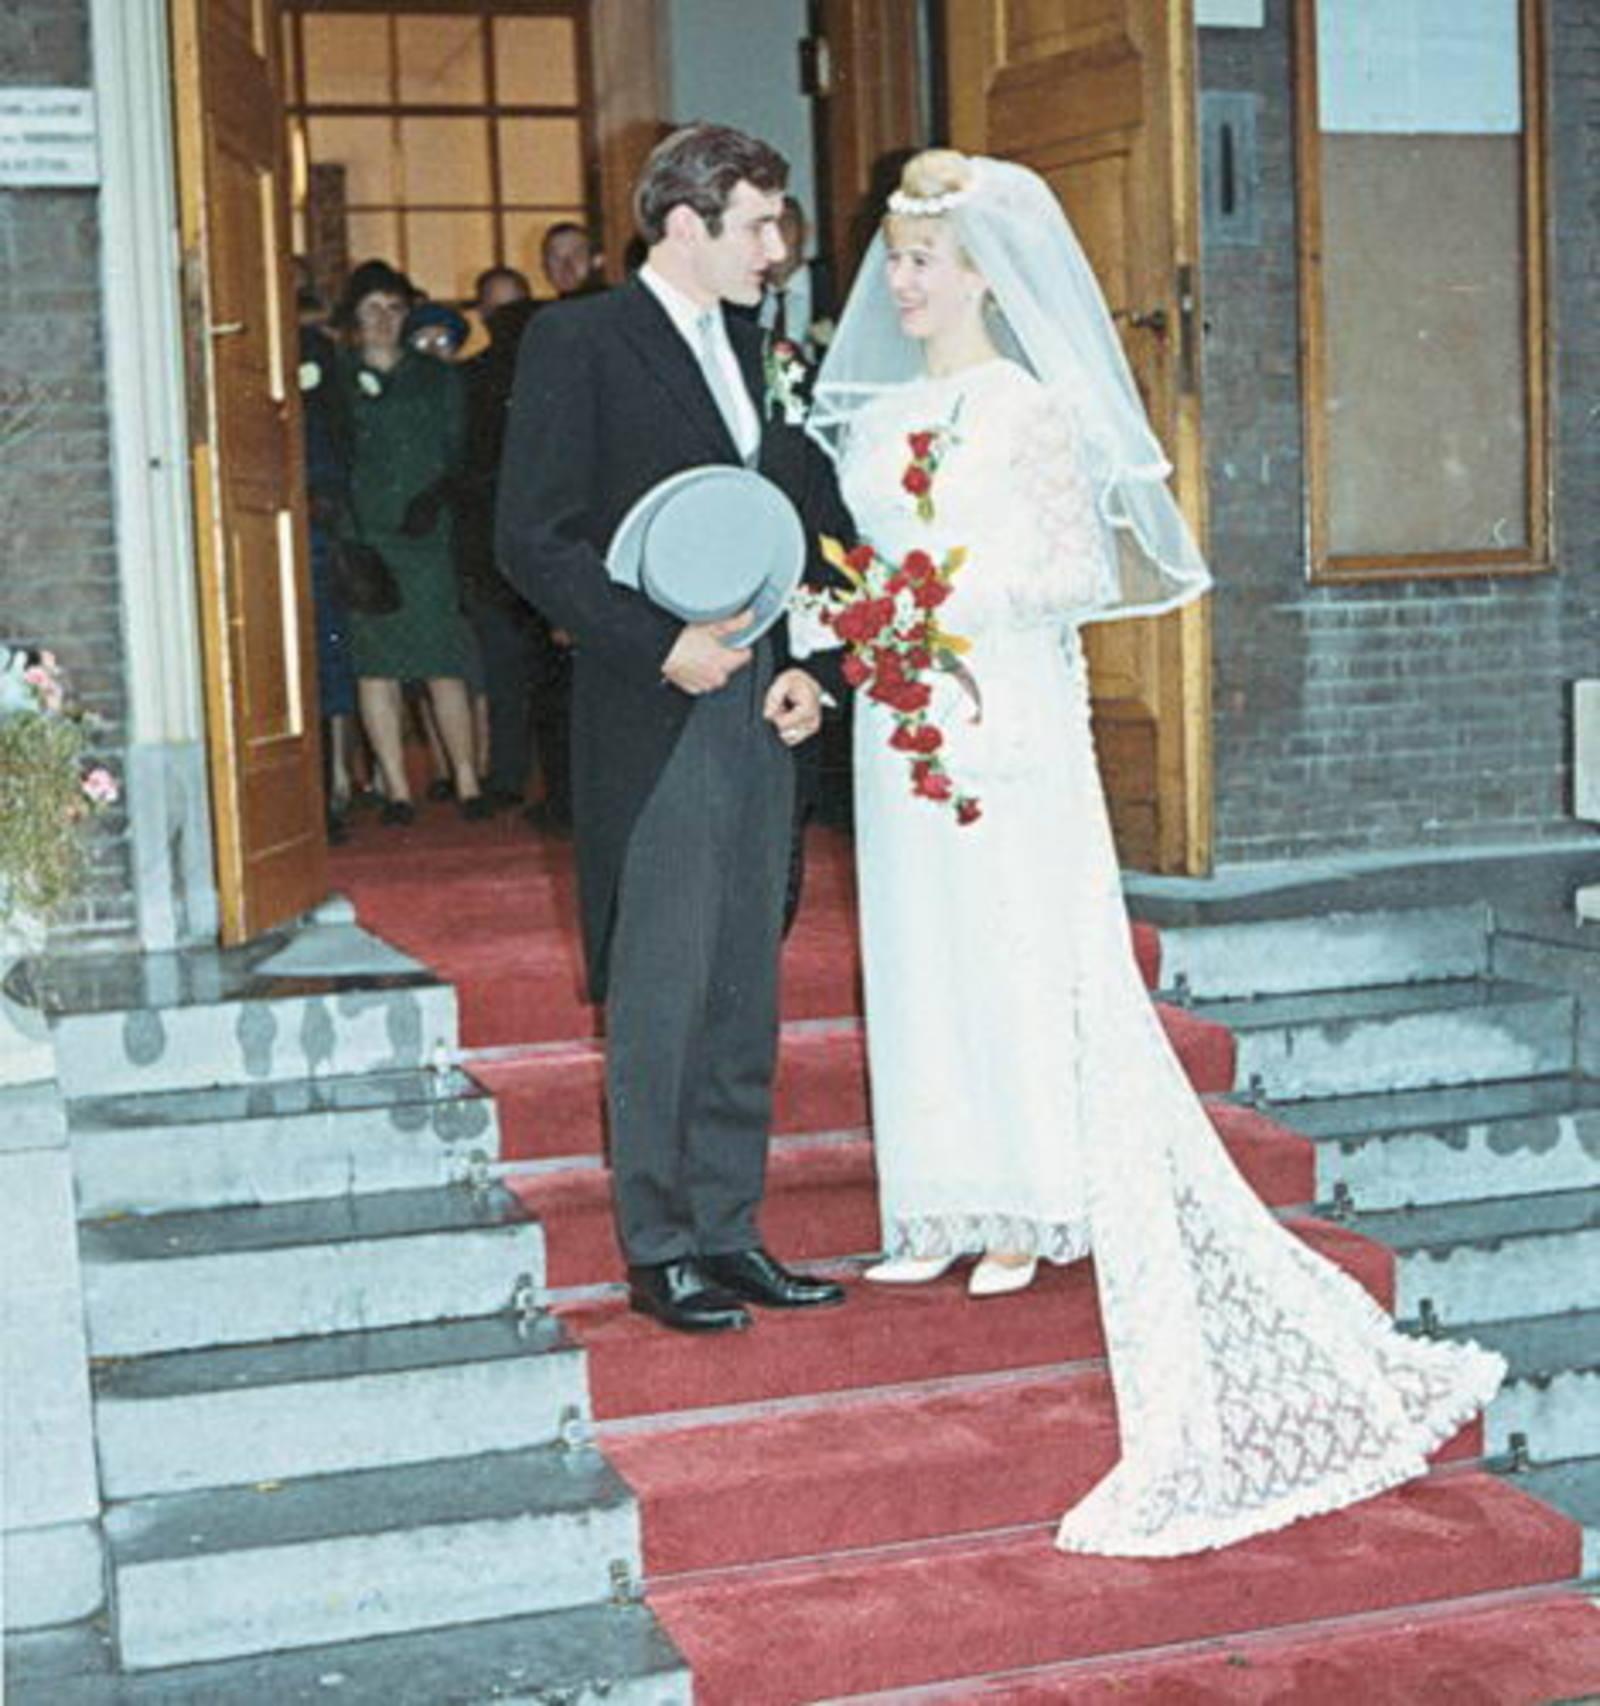 Imanse Rina 1950 1967 trouwt Piet Geluk 04